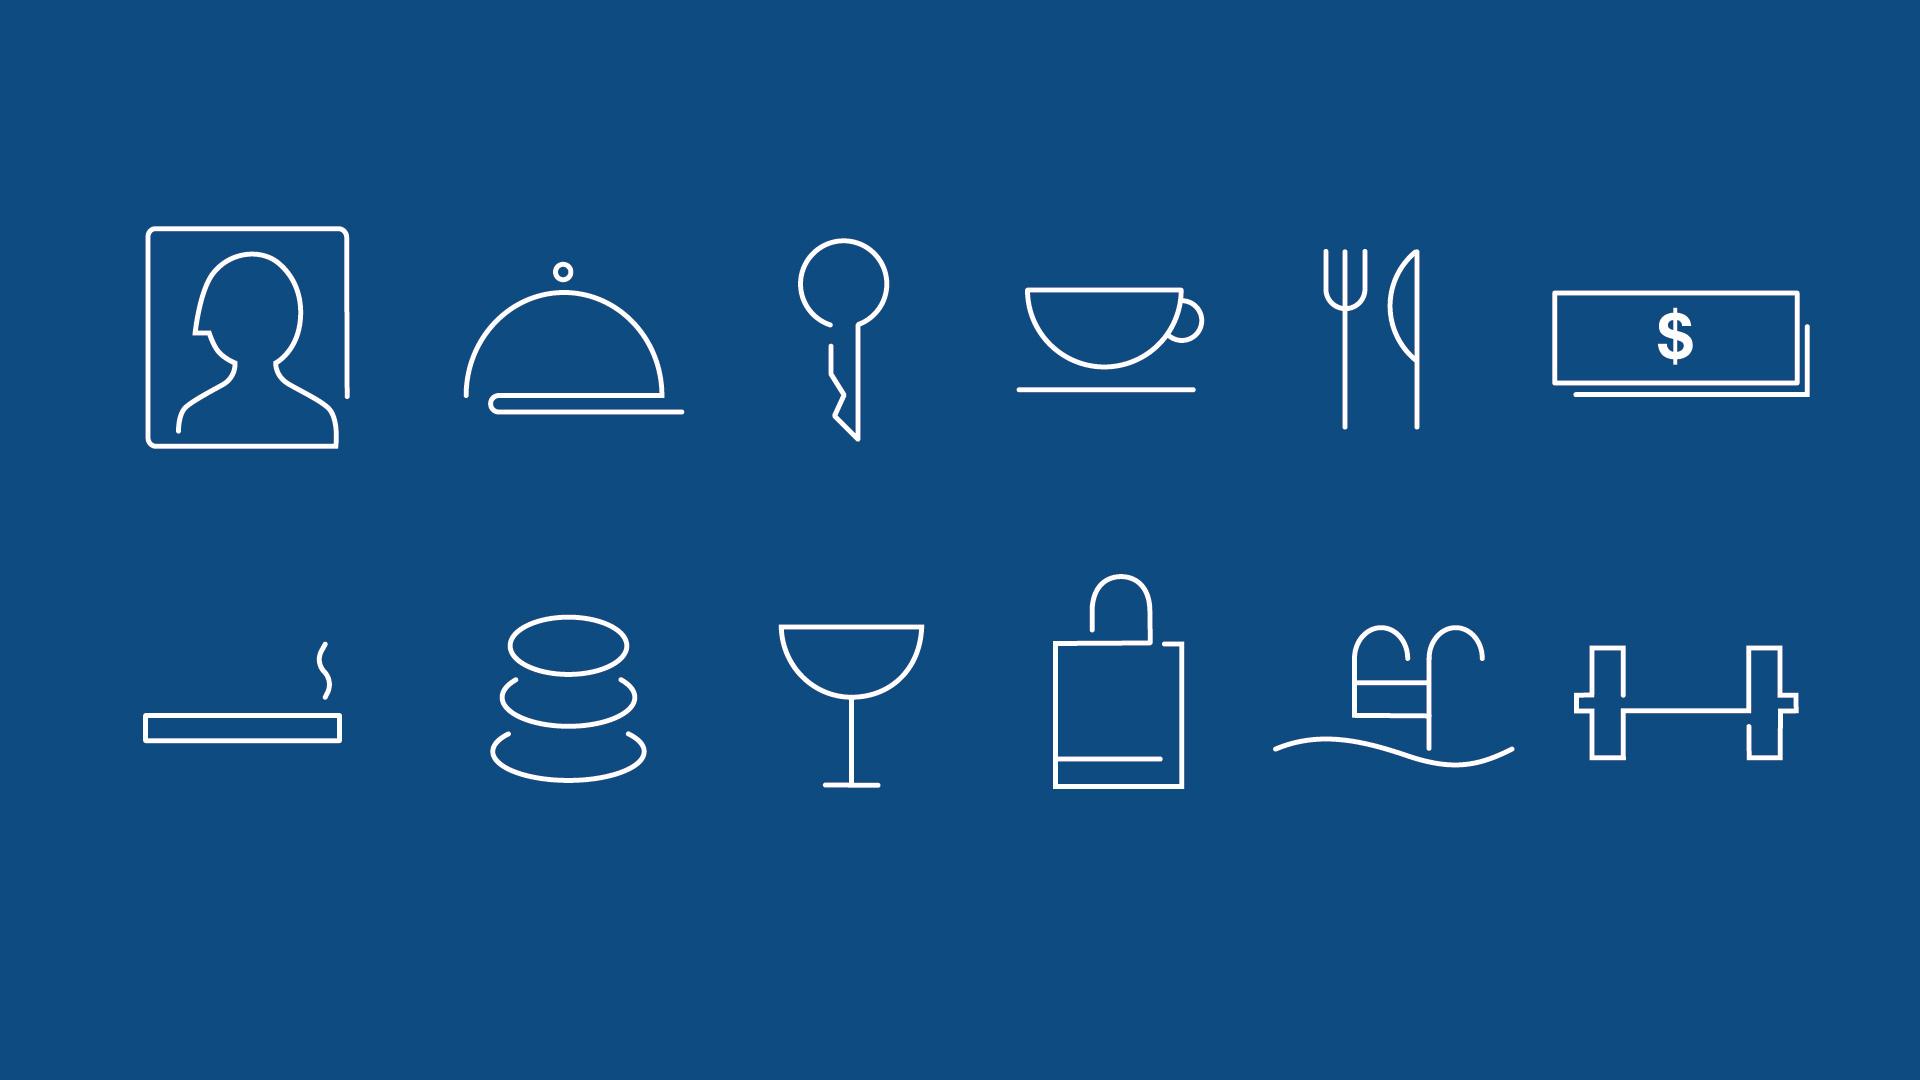 Icon designs.